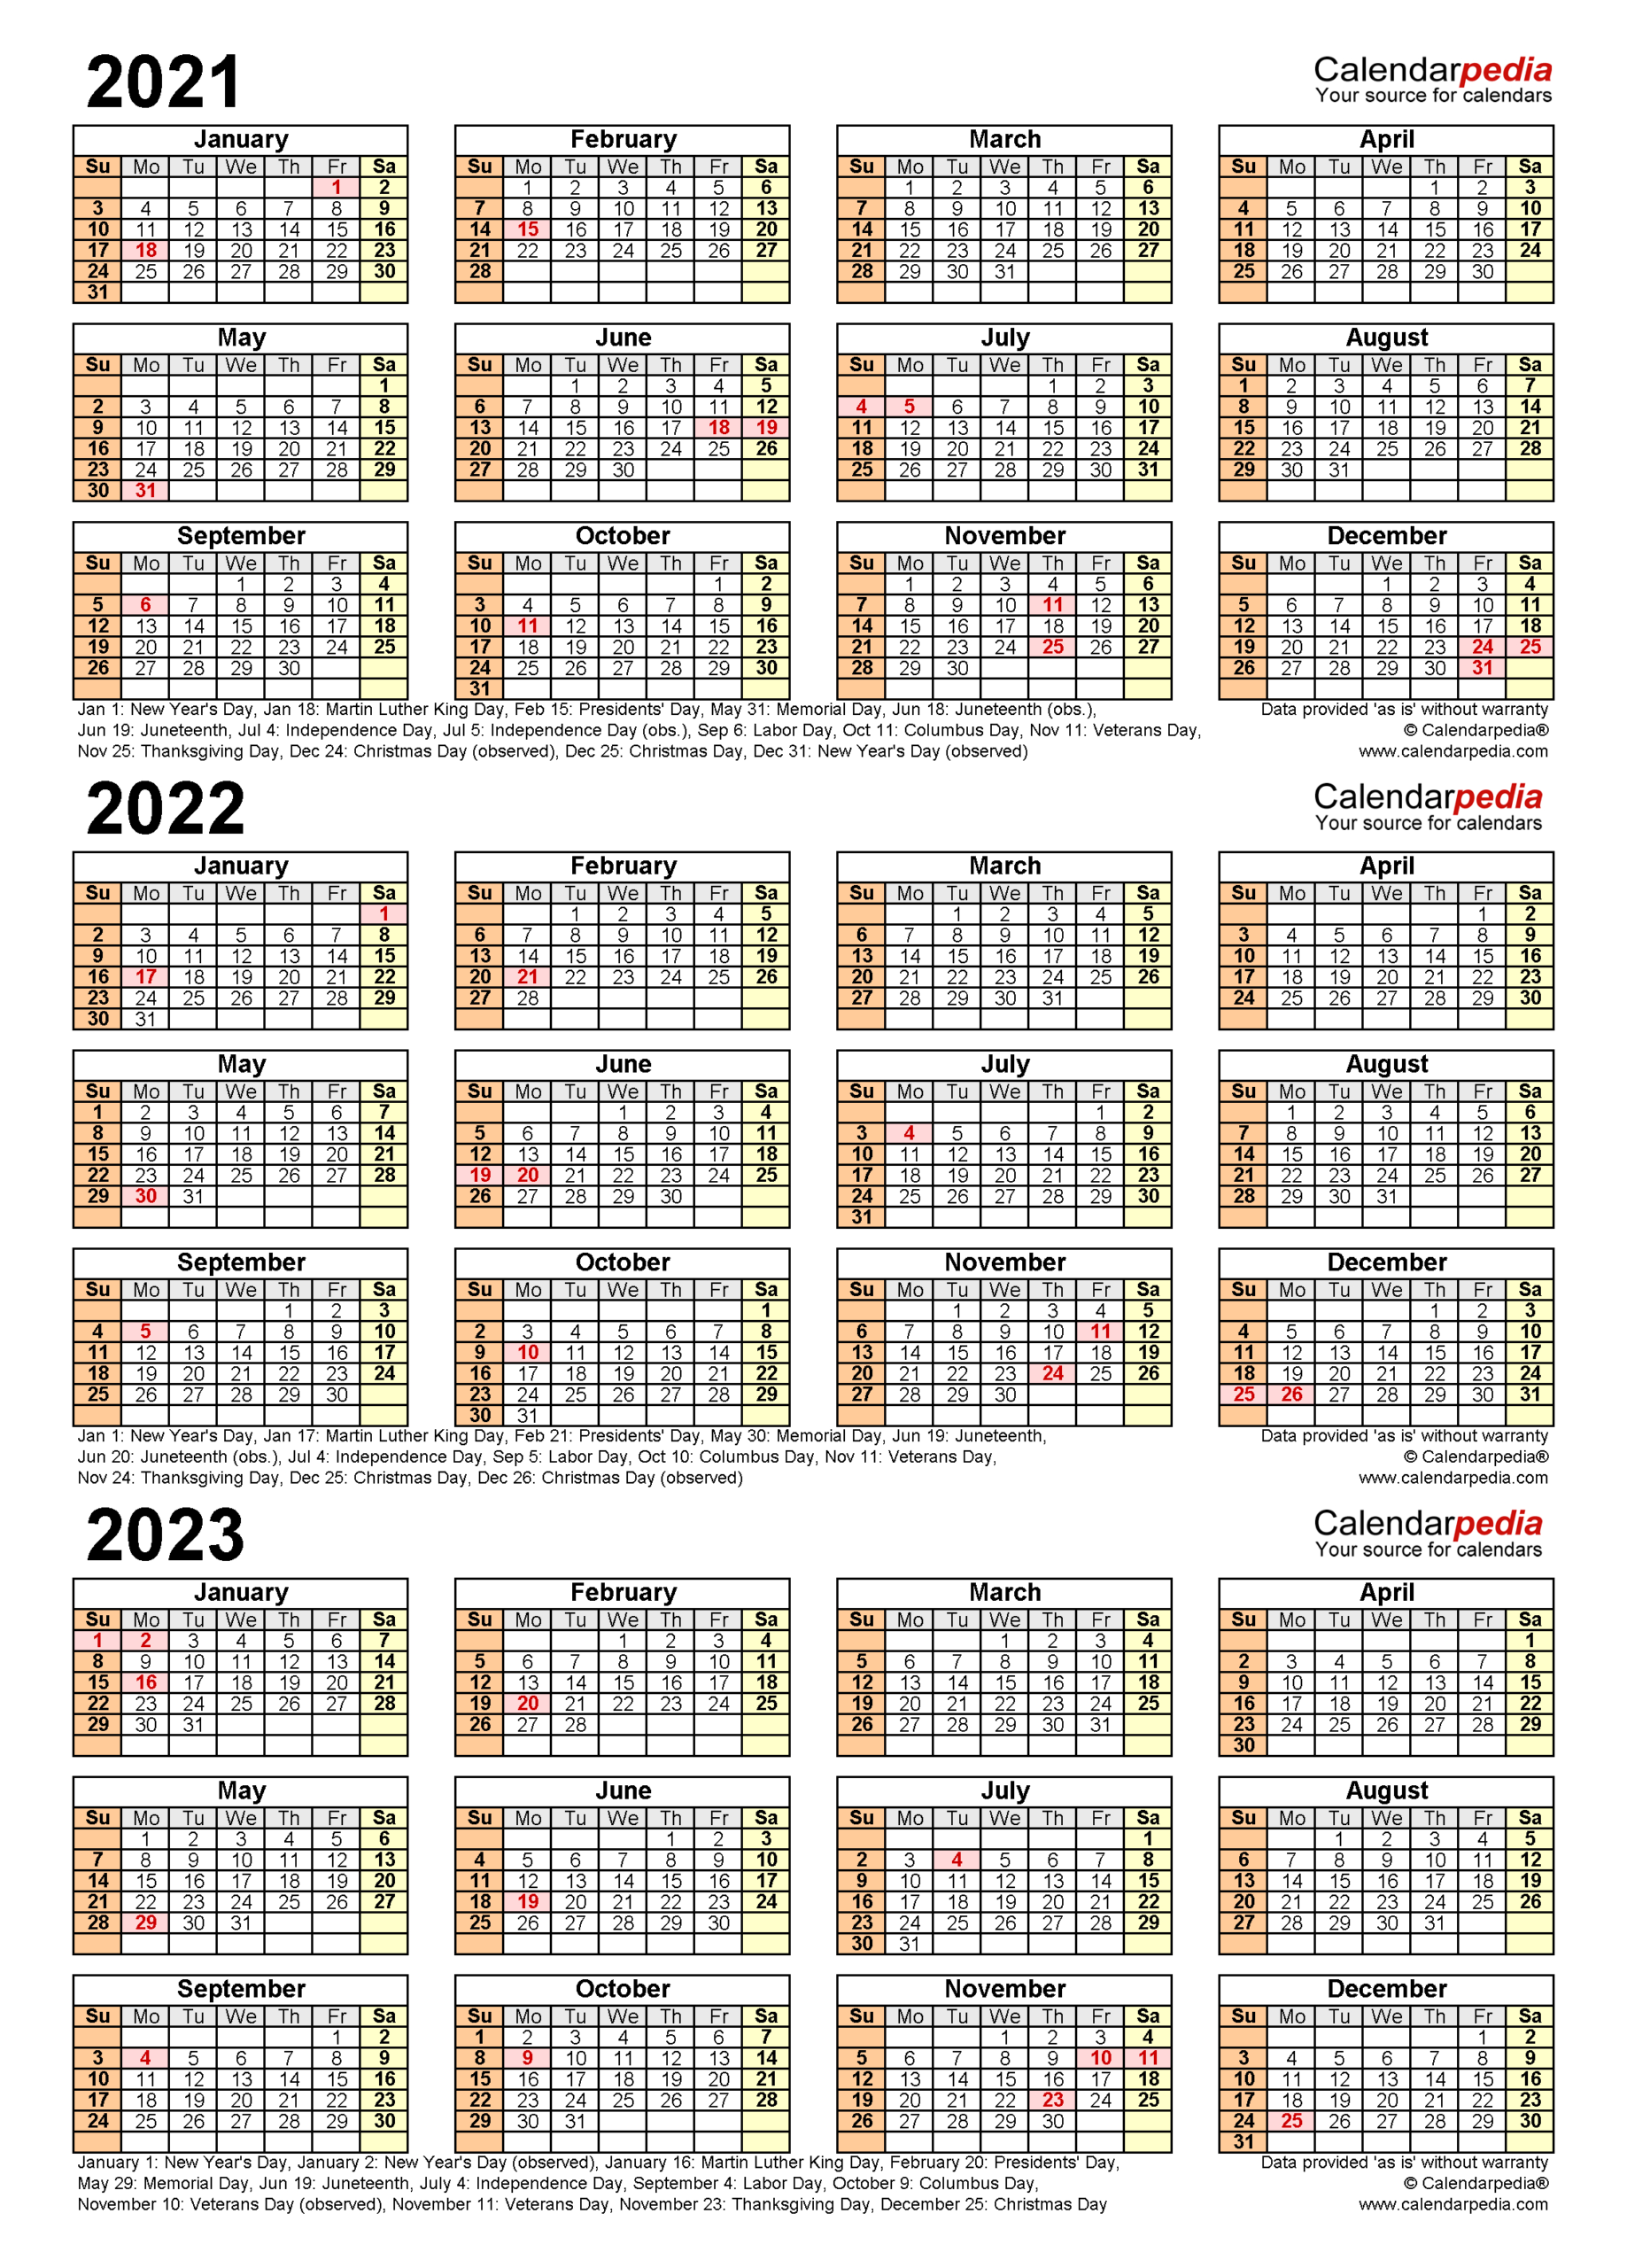 2021-2023 Three Year Calendar - Free Printable Excel Templates-2021 2022 2023 Printable Calendar